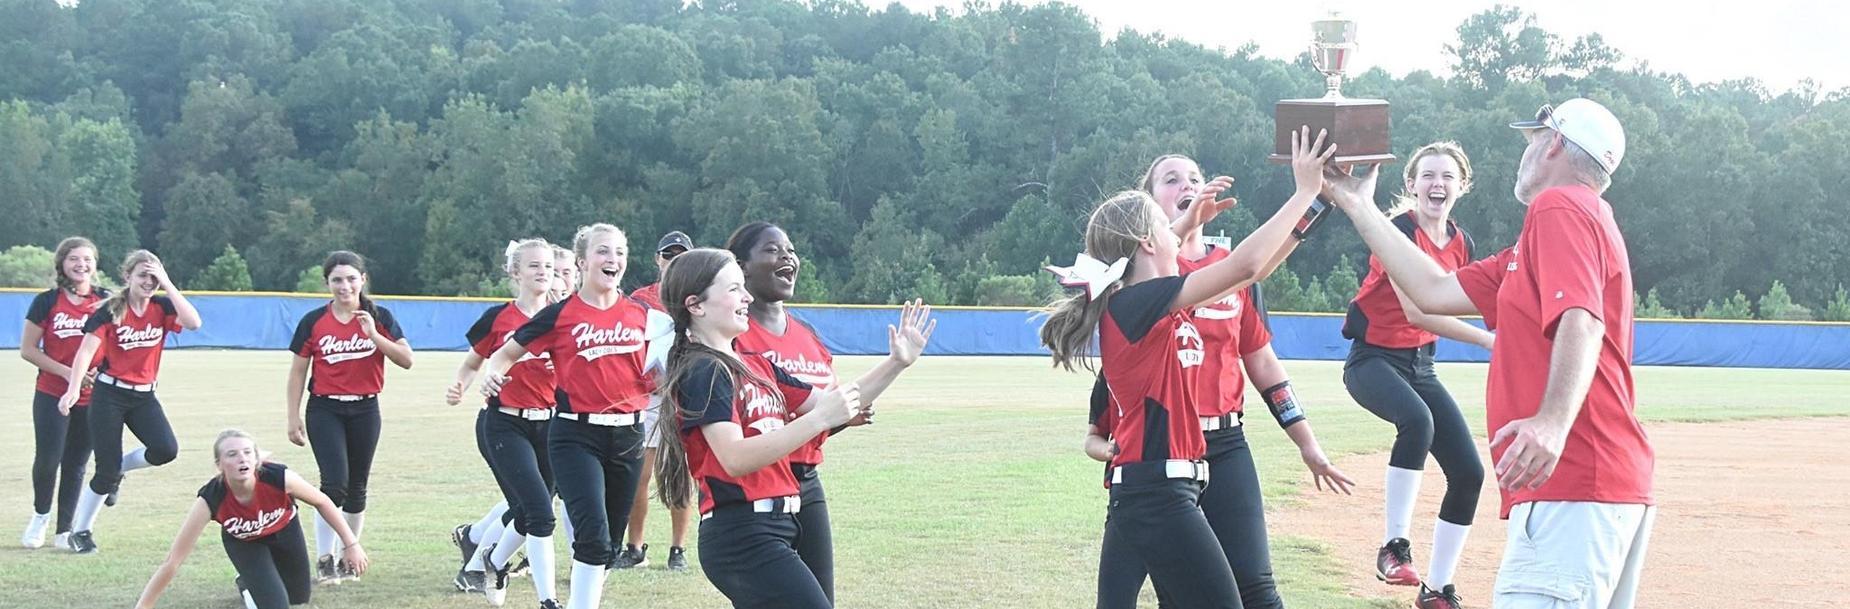 A-Team Softball County Champs